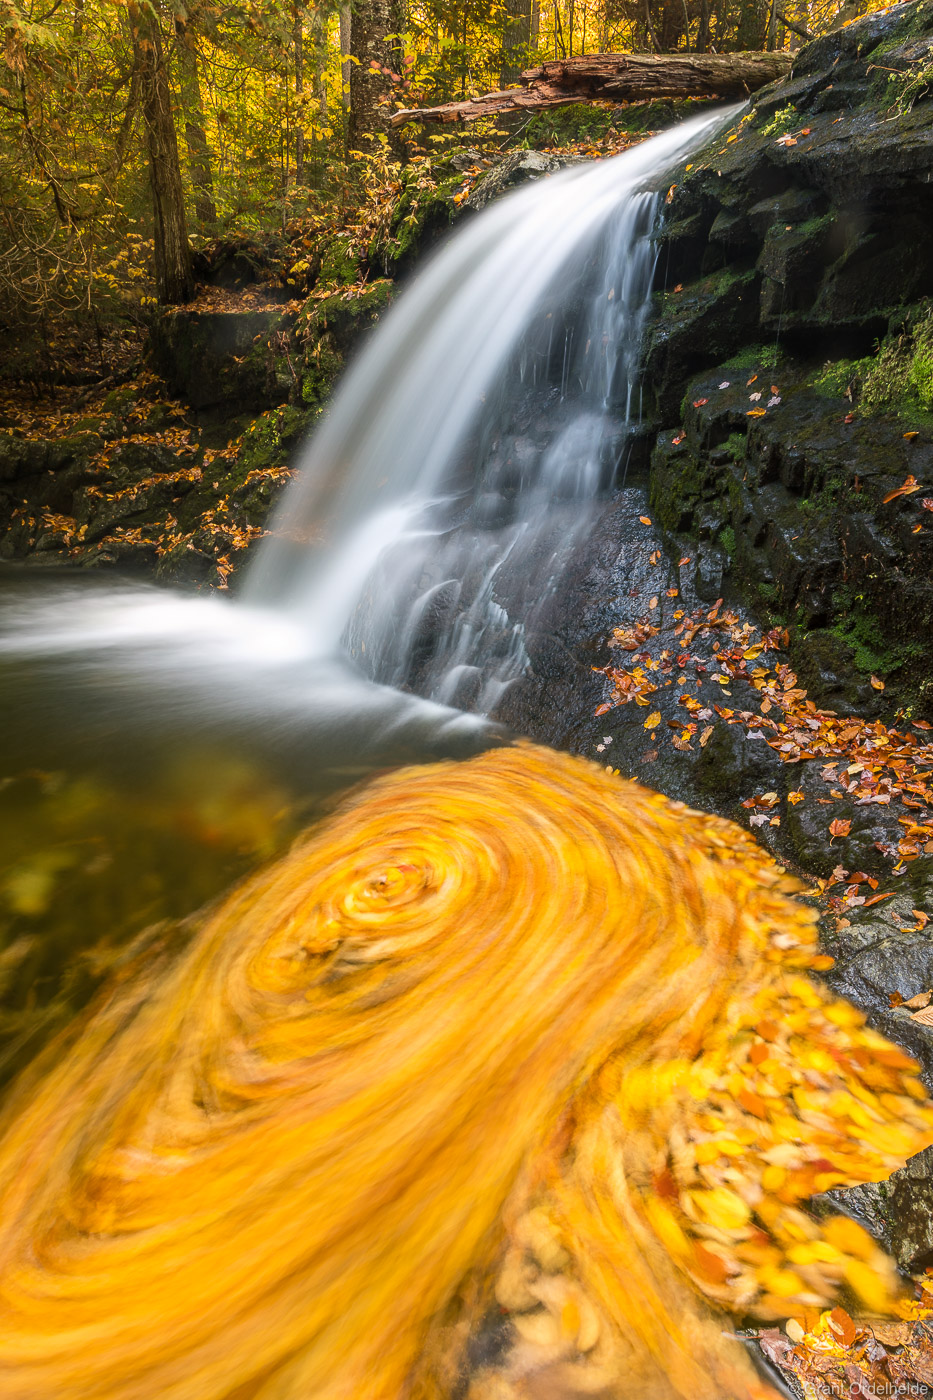 adirondack, swirl, lake, placid, waterfall, pool, spinning, leaves, creek, mountains, photo